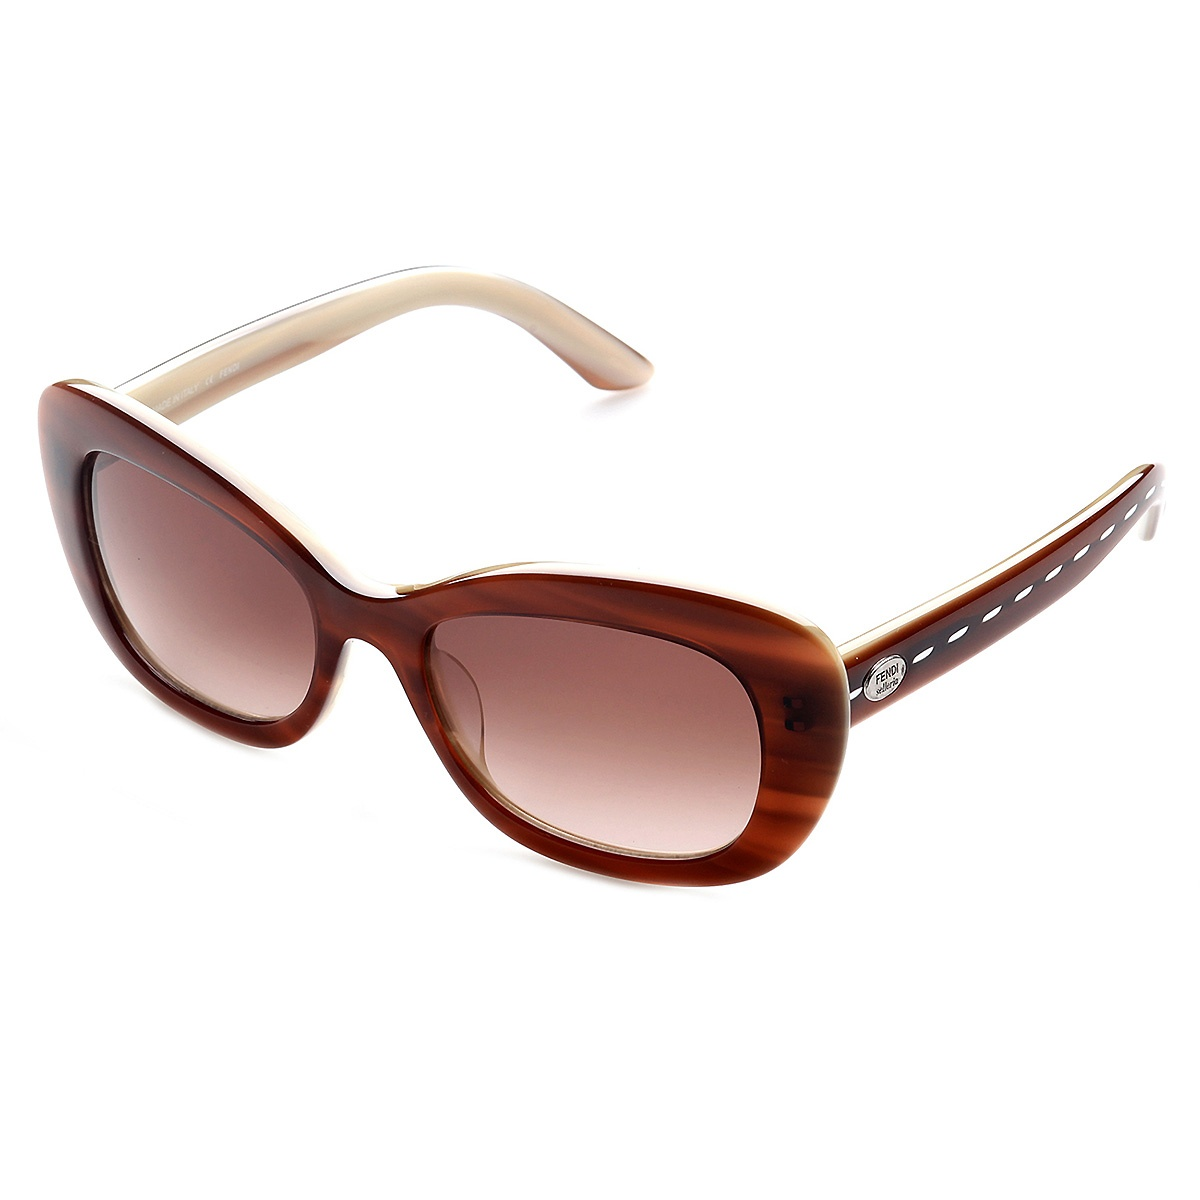 Details zu Fendi Sonnenbrille FS5216_227 Damen Braun Cateye Sunglasses Women NEU & OVP